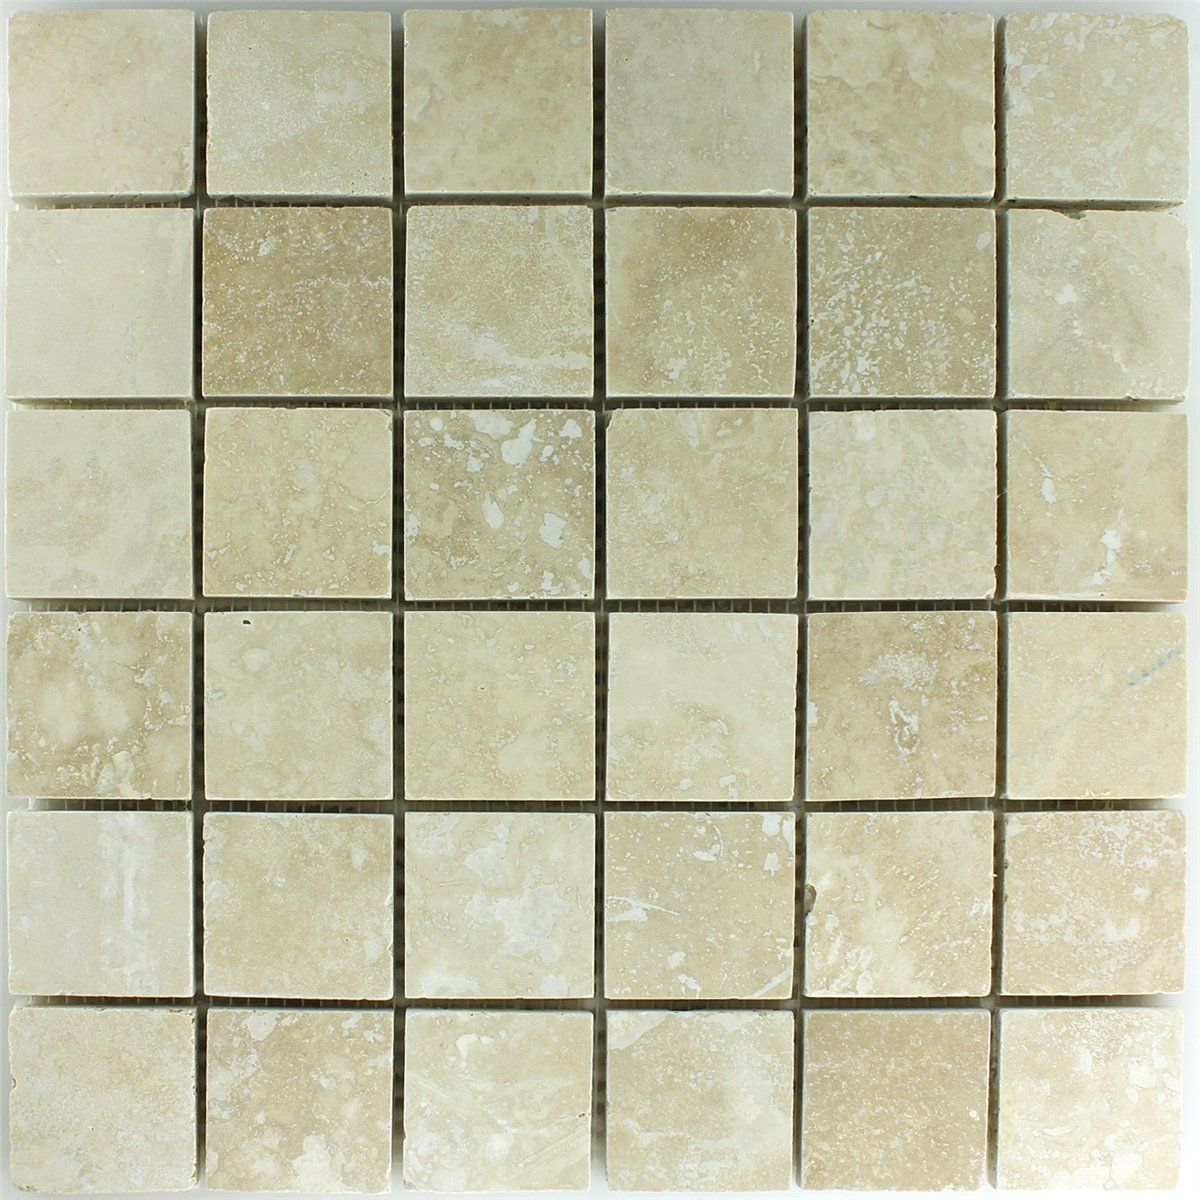 Travertin Mosaik Fliesen Beige Gespachtelt 48x48x10mm | Ikea-reworks ...